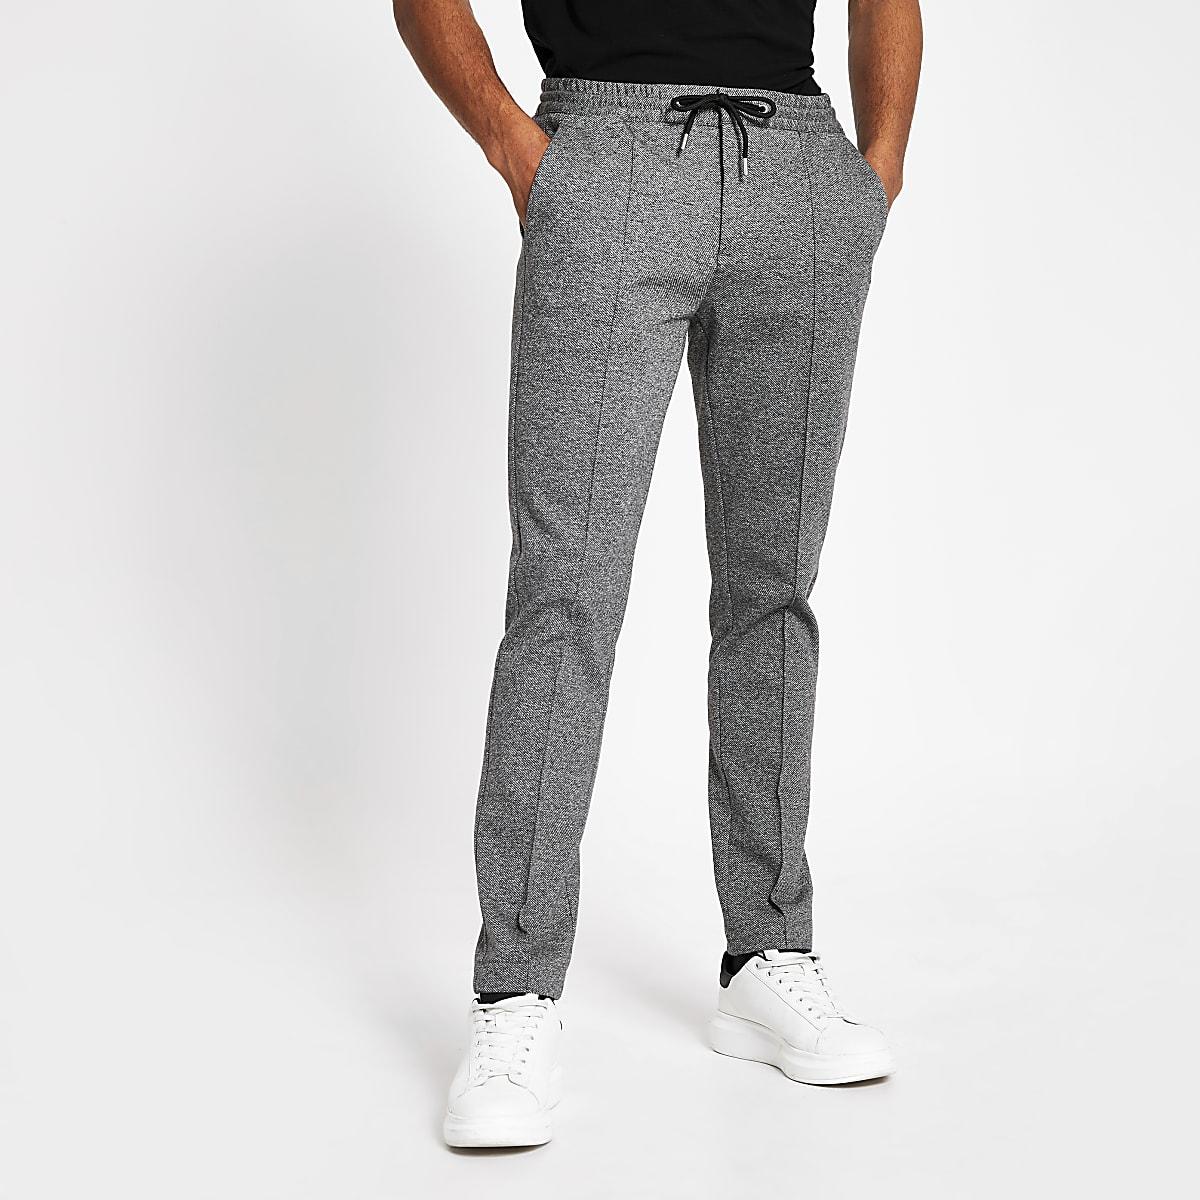 Dark grey skinny fit smart joggers